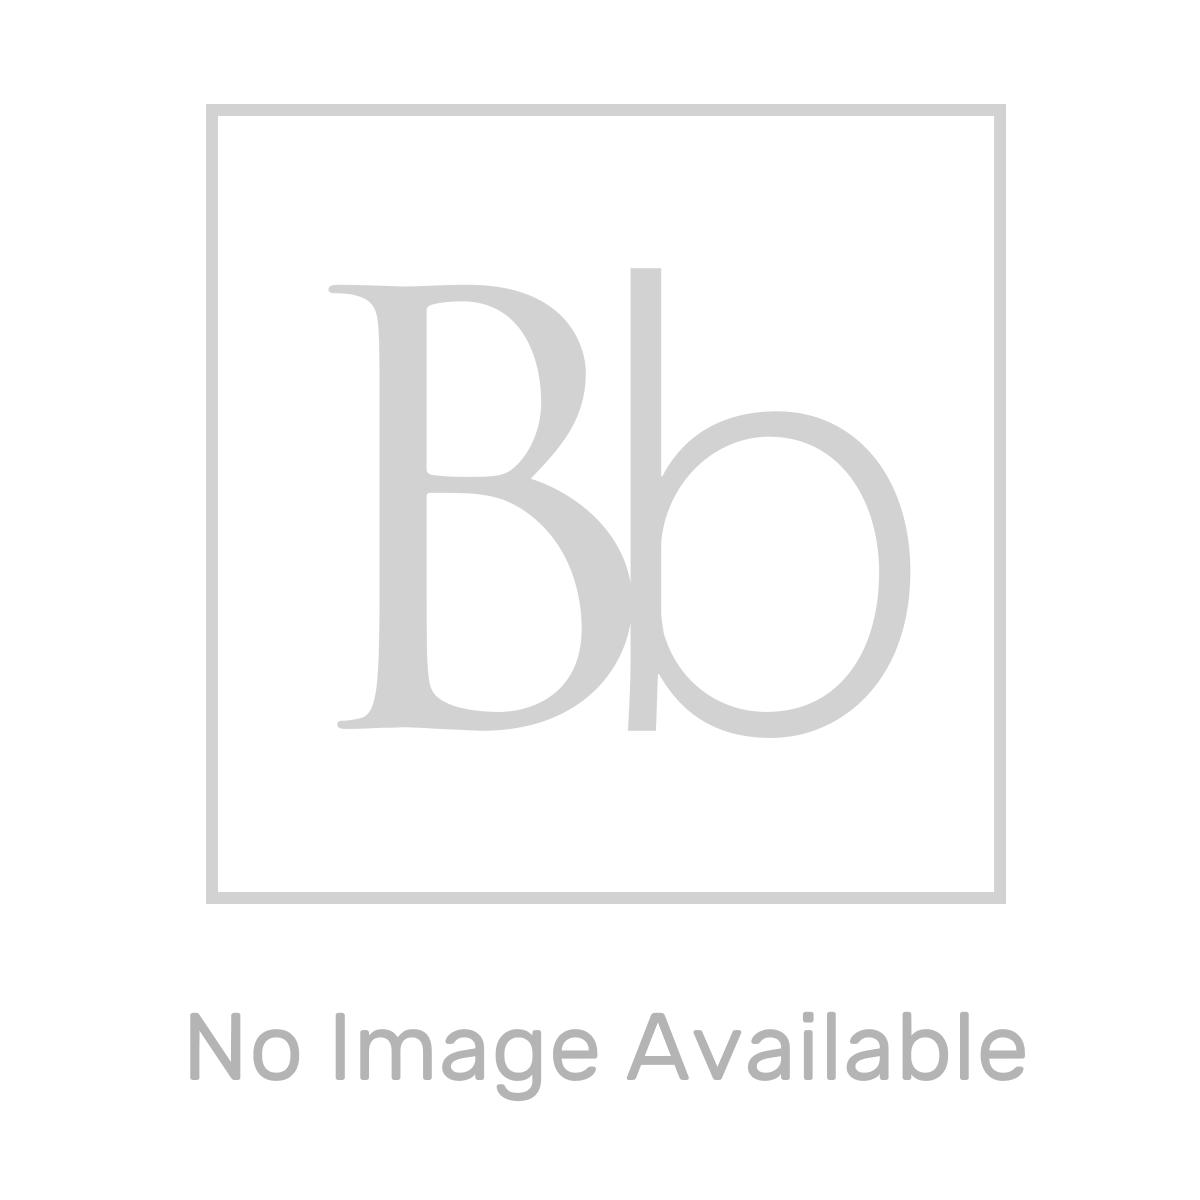 Frontline Vida Gloss White Wall Mounted Tall Unit